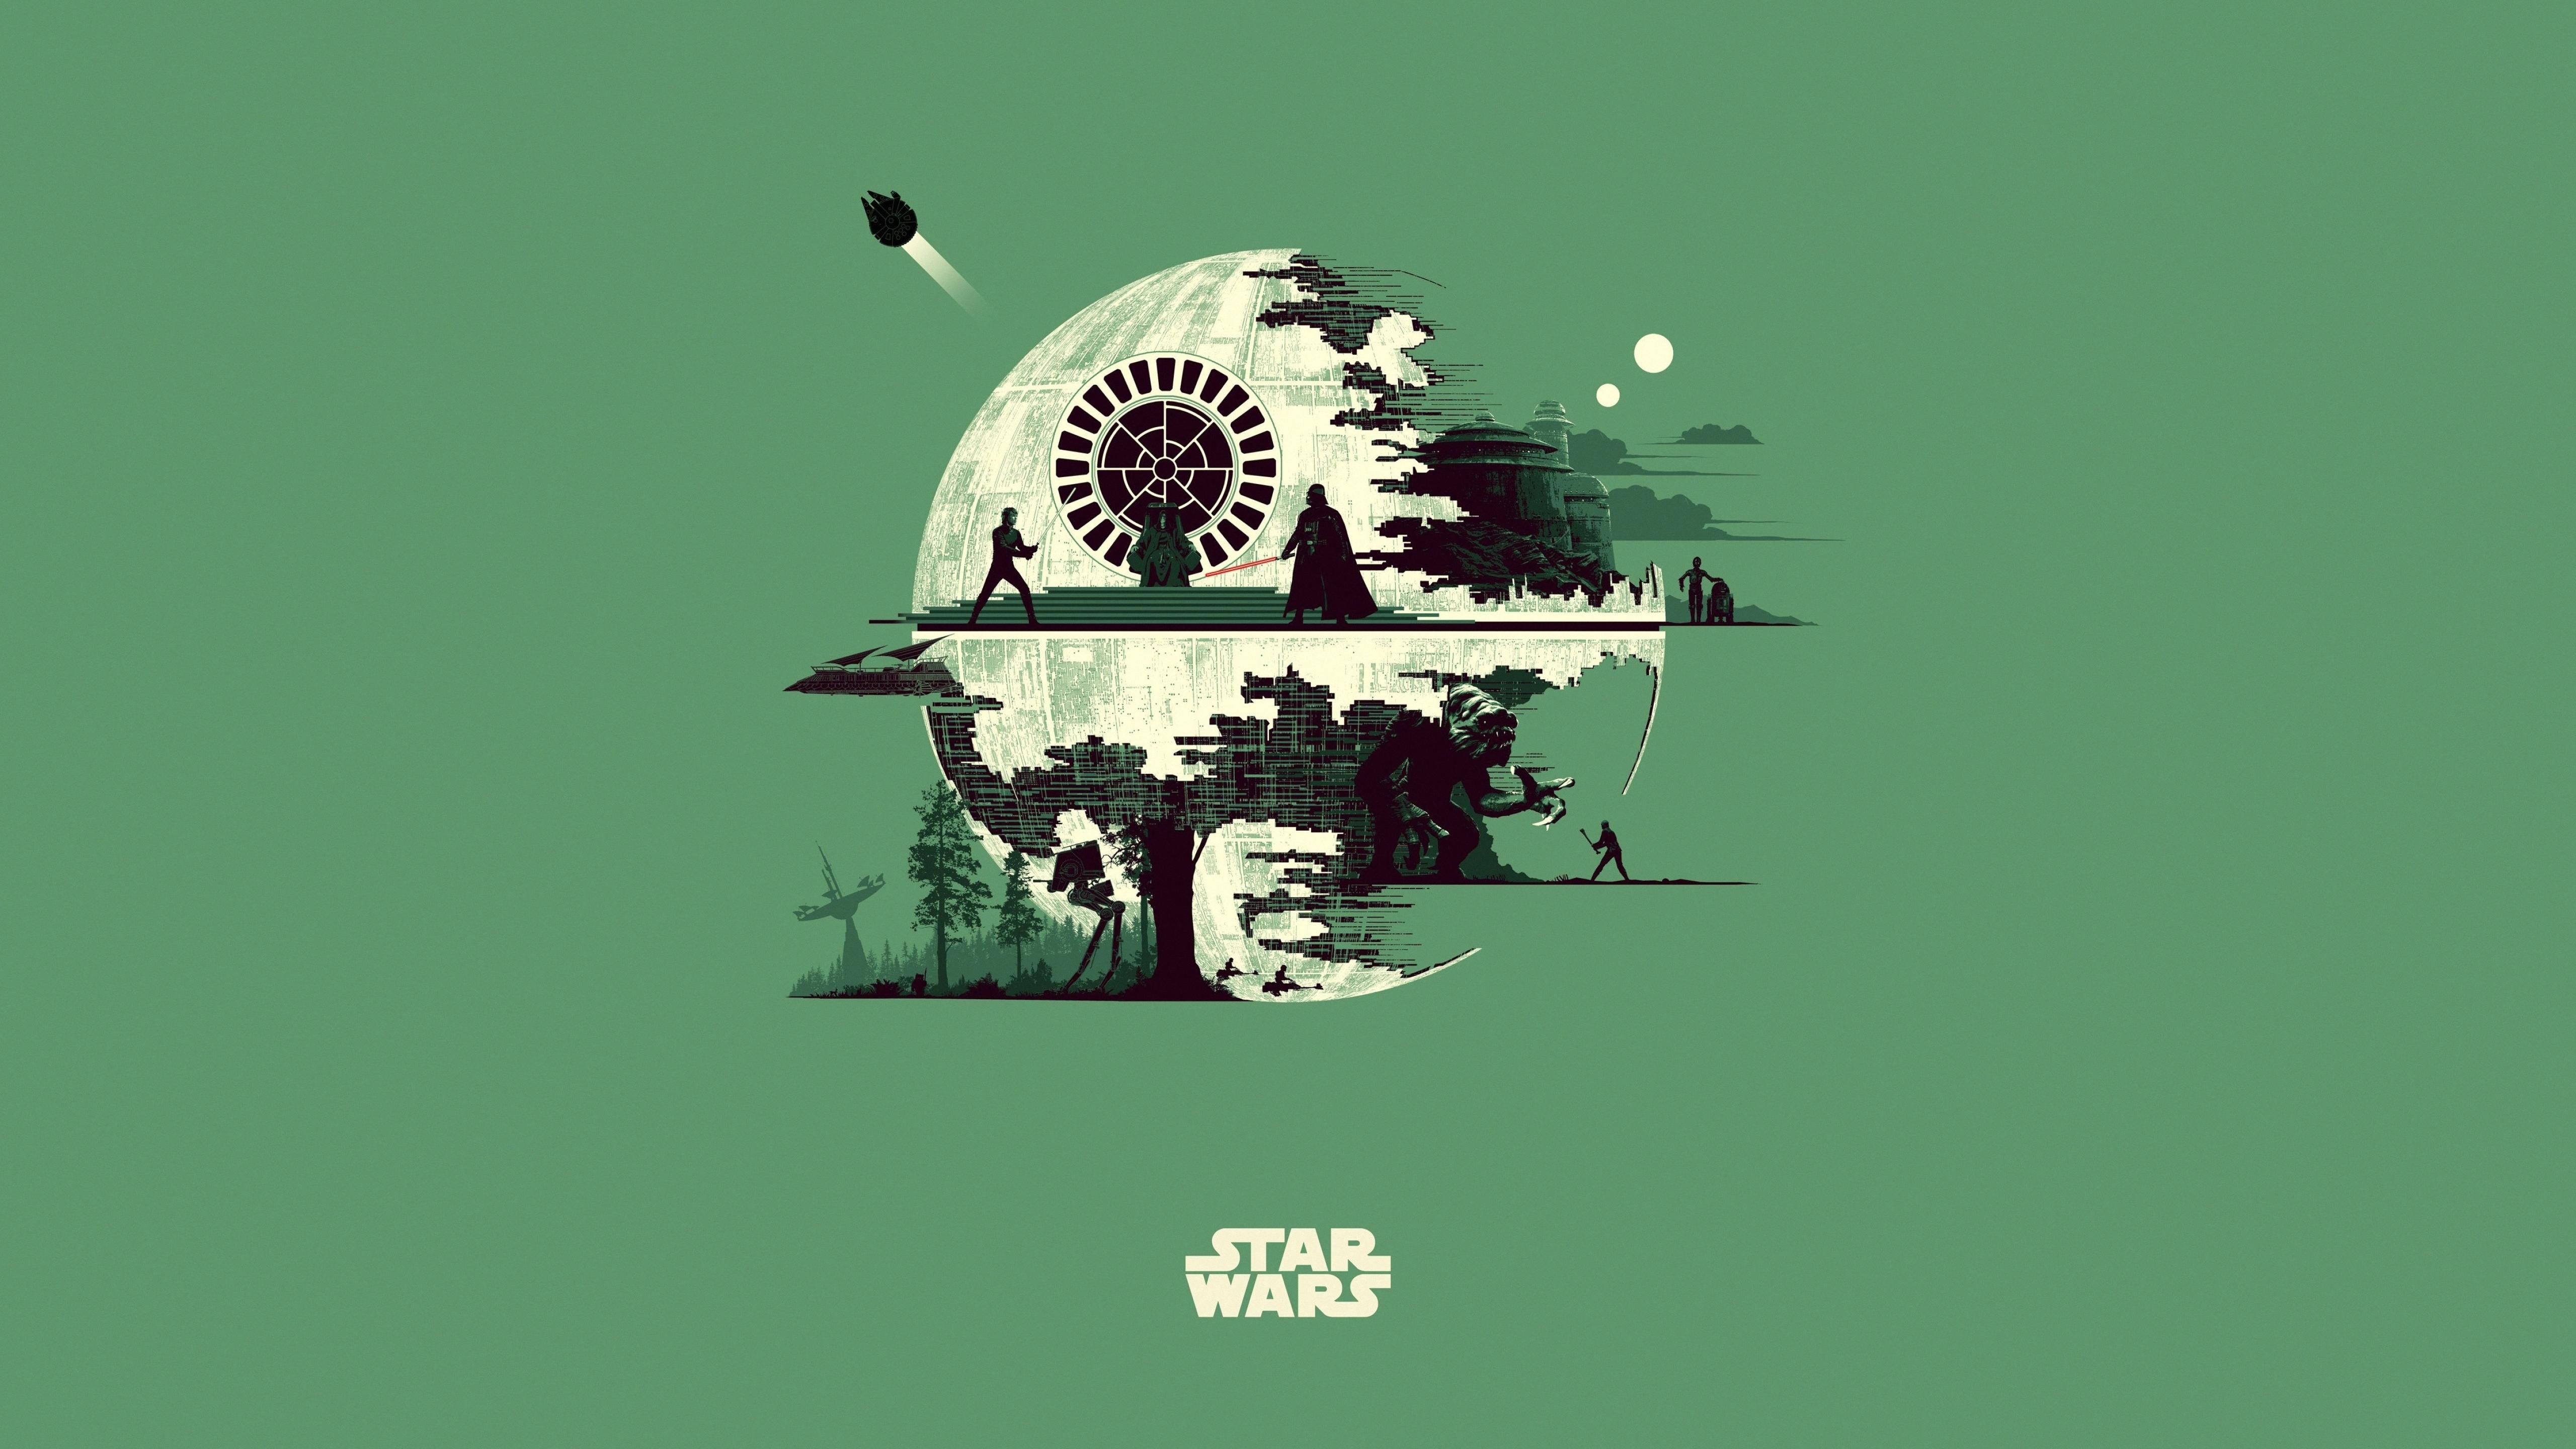 5120x2880 Star Wars Skywalker Saga Minimal 5k Wallpaper Hd Movies 4k Wallpapers Images Photos And Background